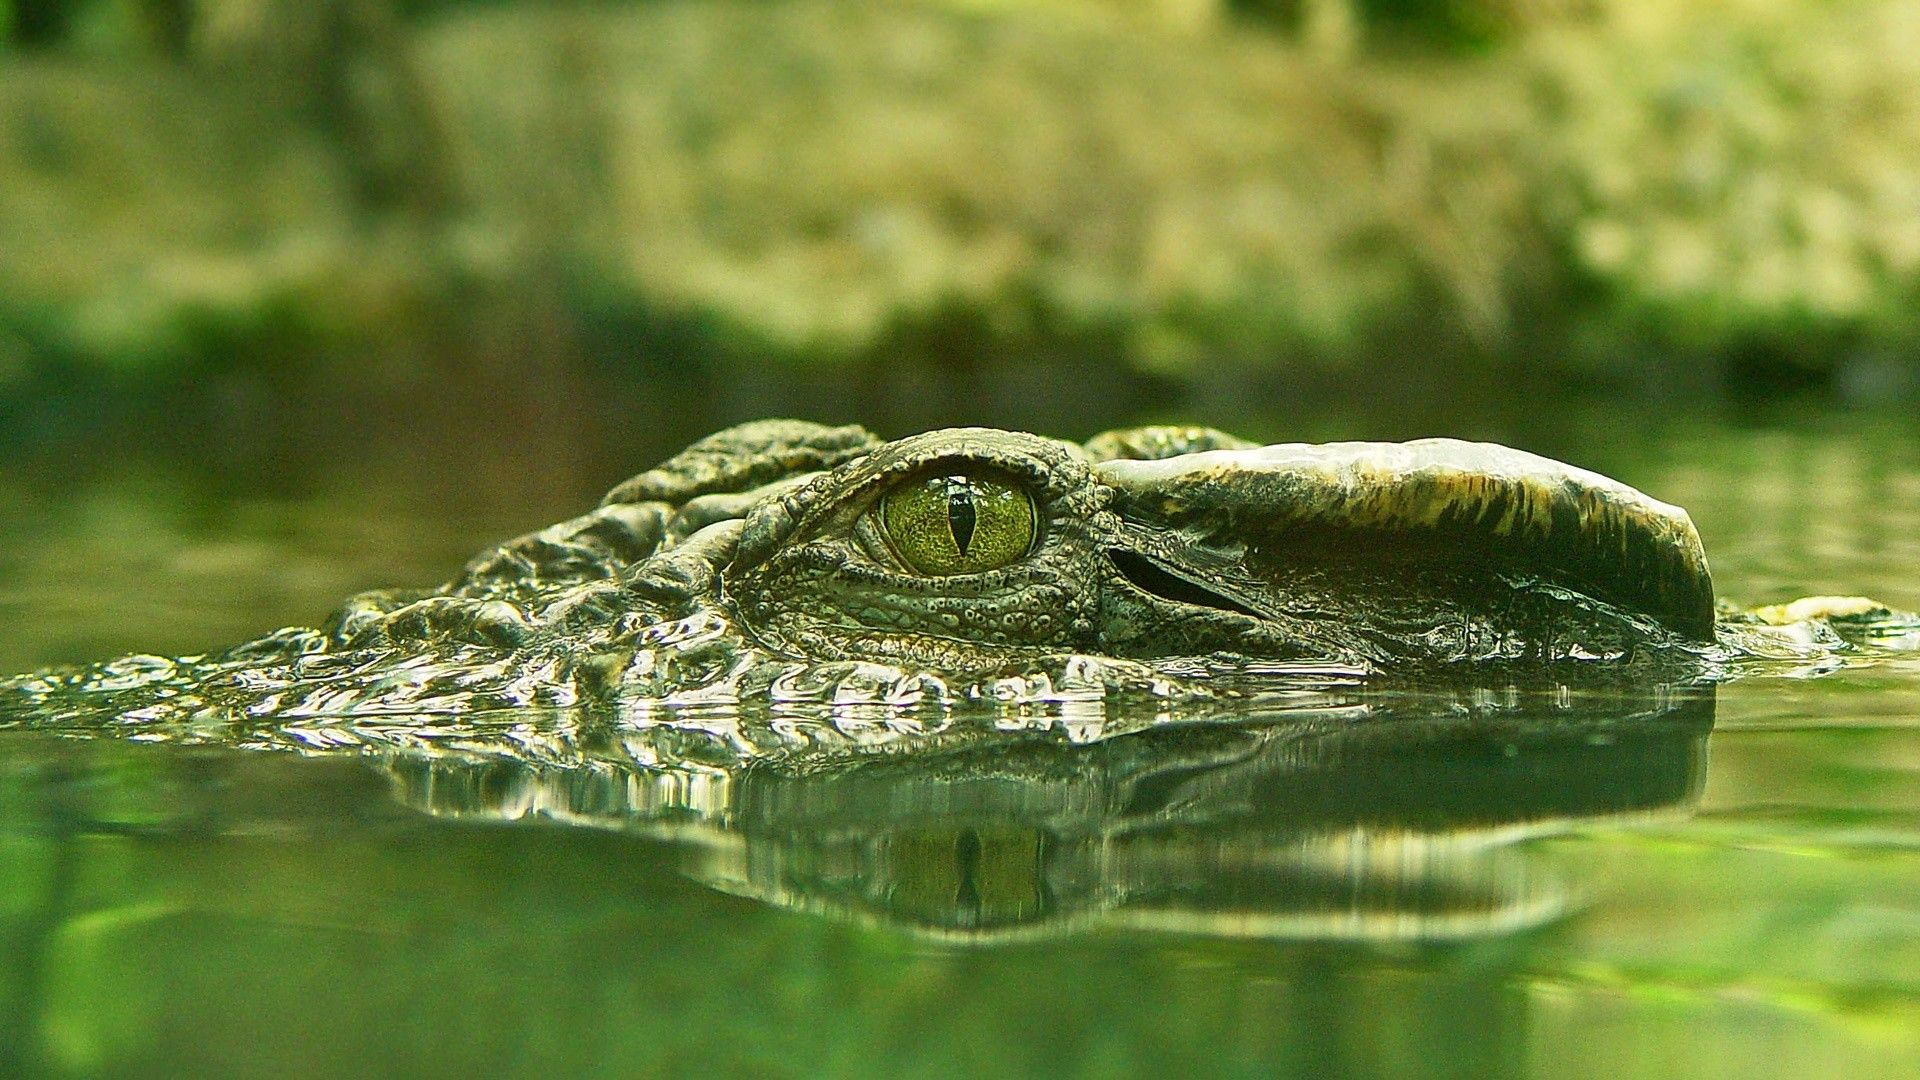 crocodile wallpaper hd